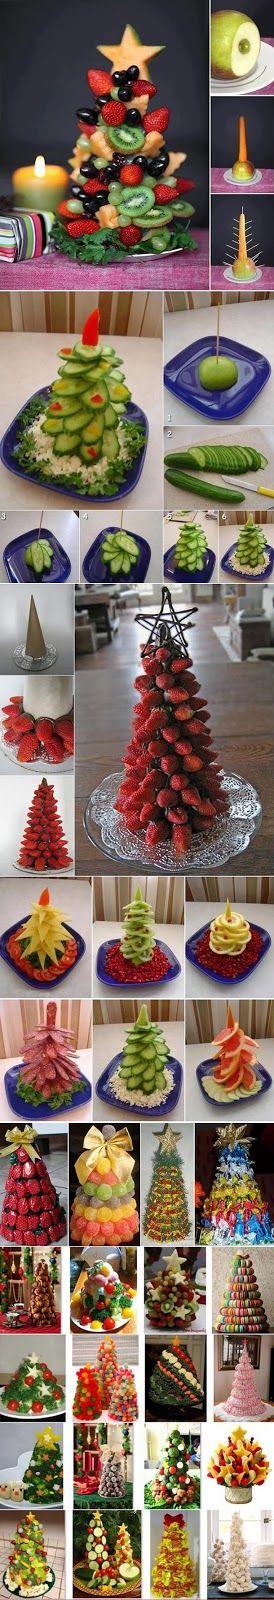 Fruit Christmas Tree하이원카지노 77ASIAN.COM 대만카지노 고고카지노